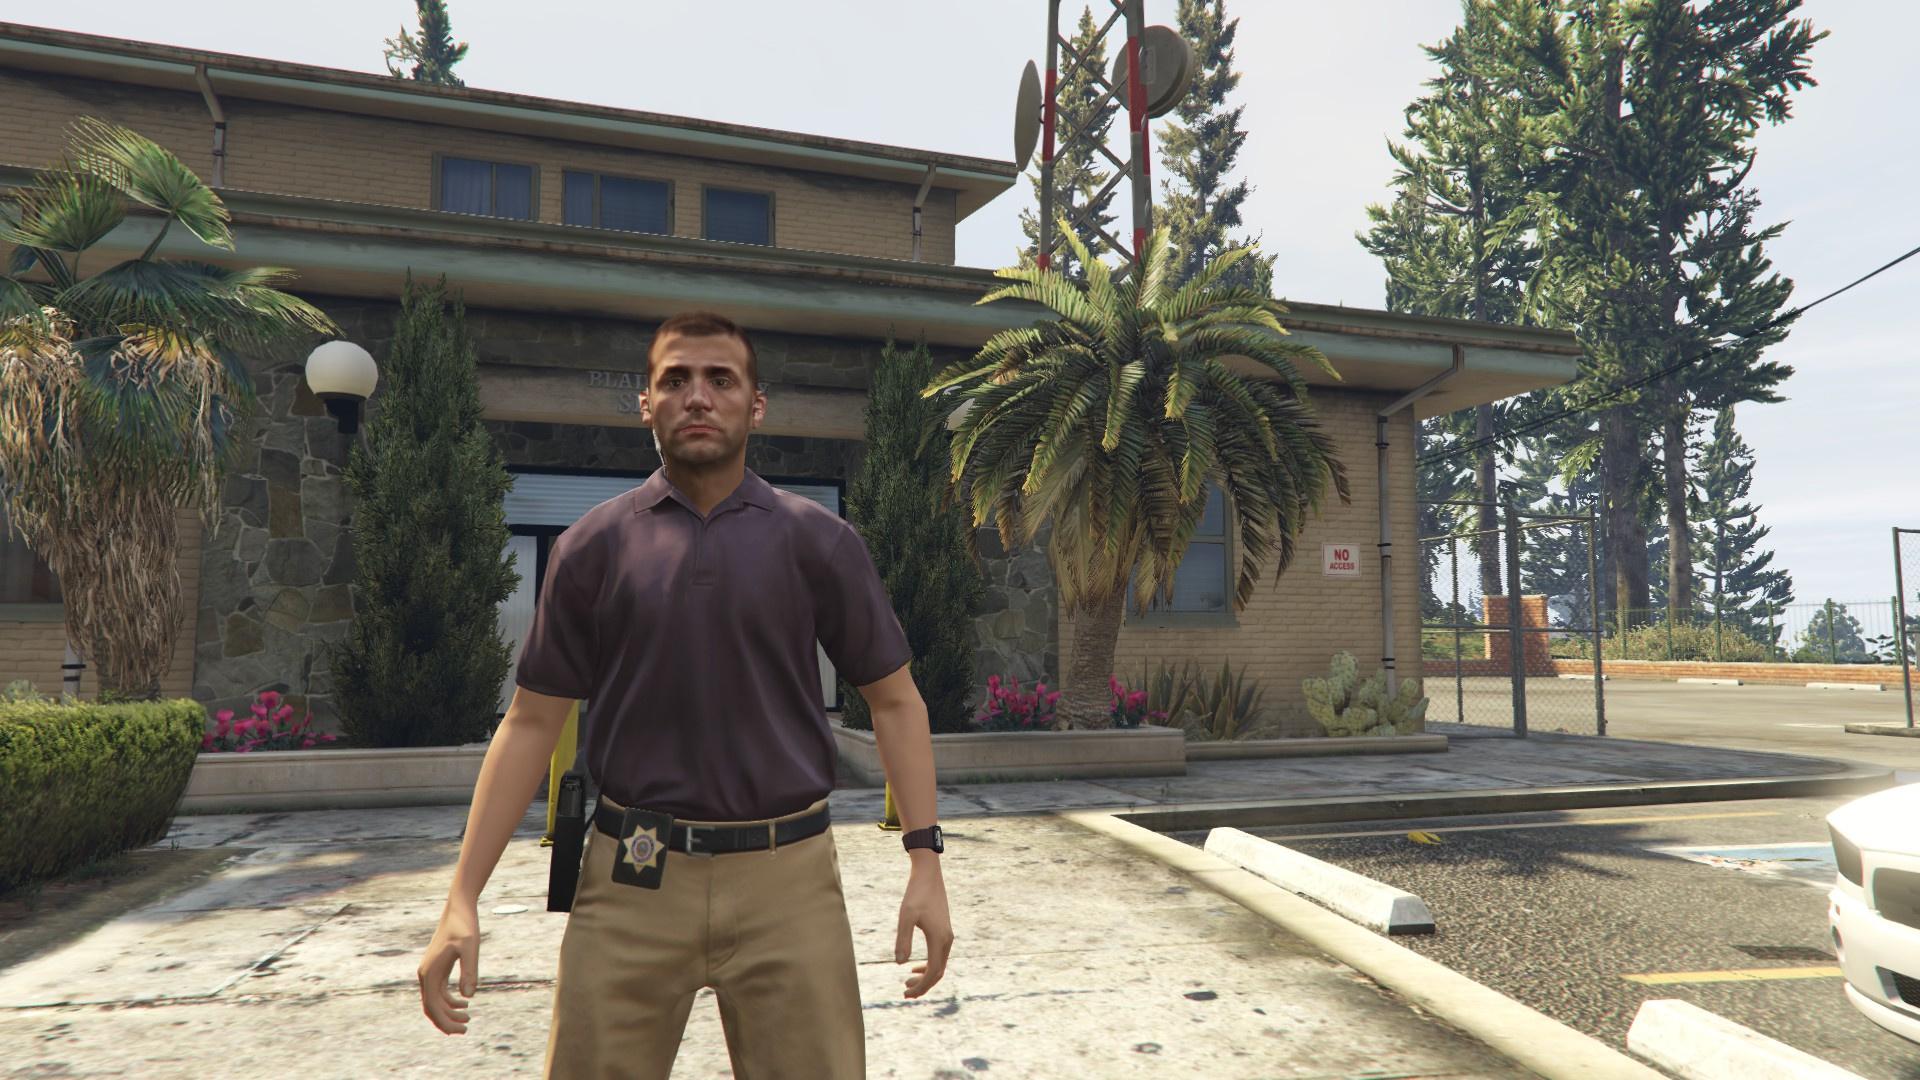 Gta 5 Los Santos Sheriff Texture